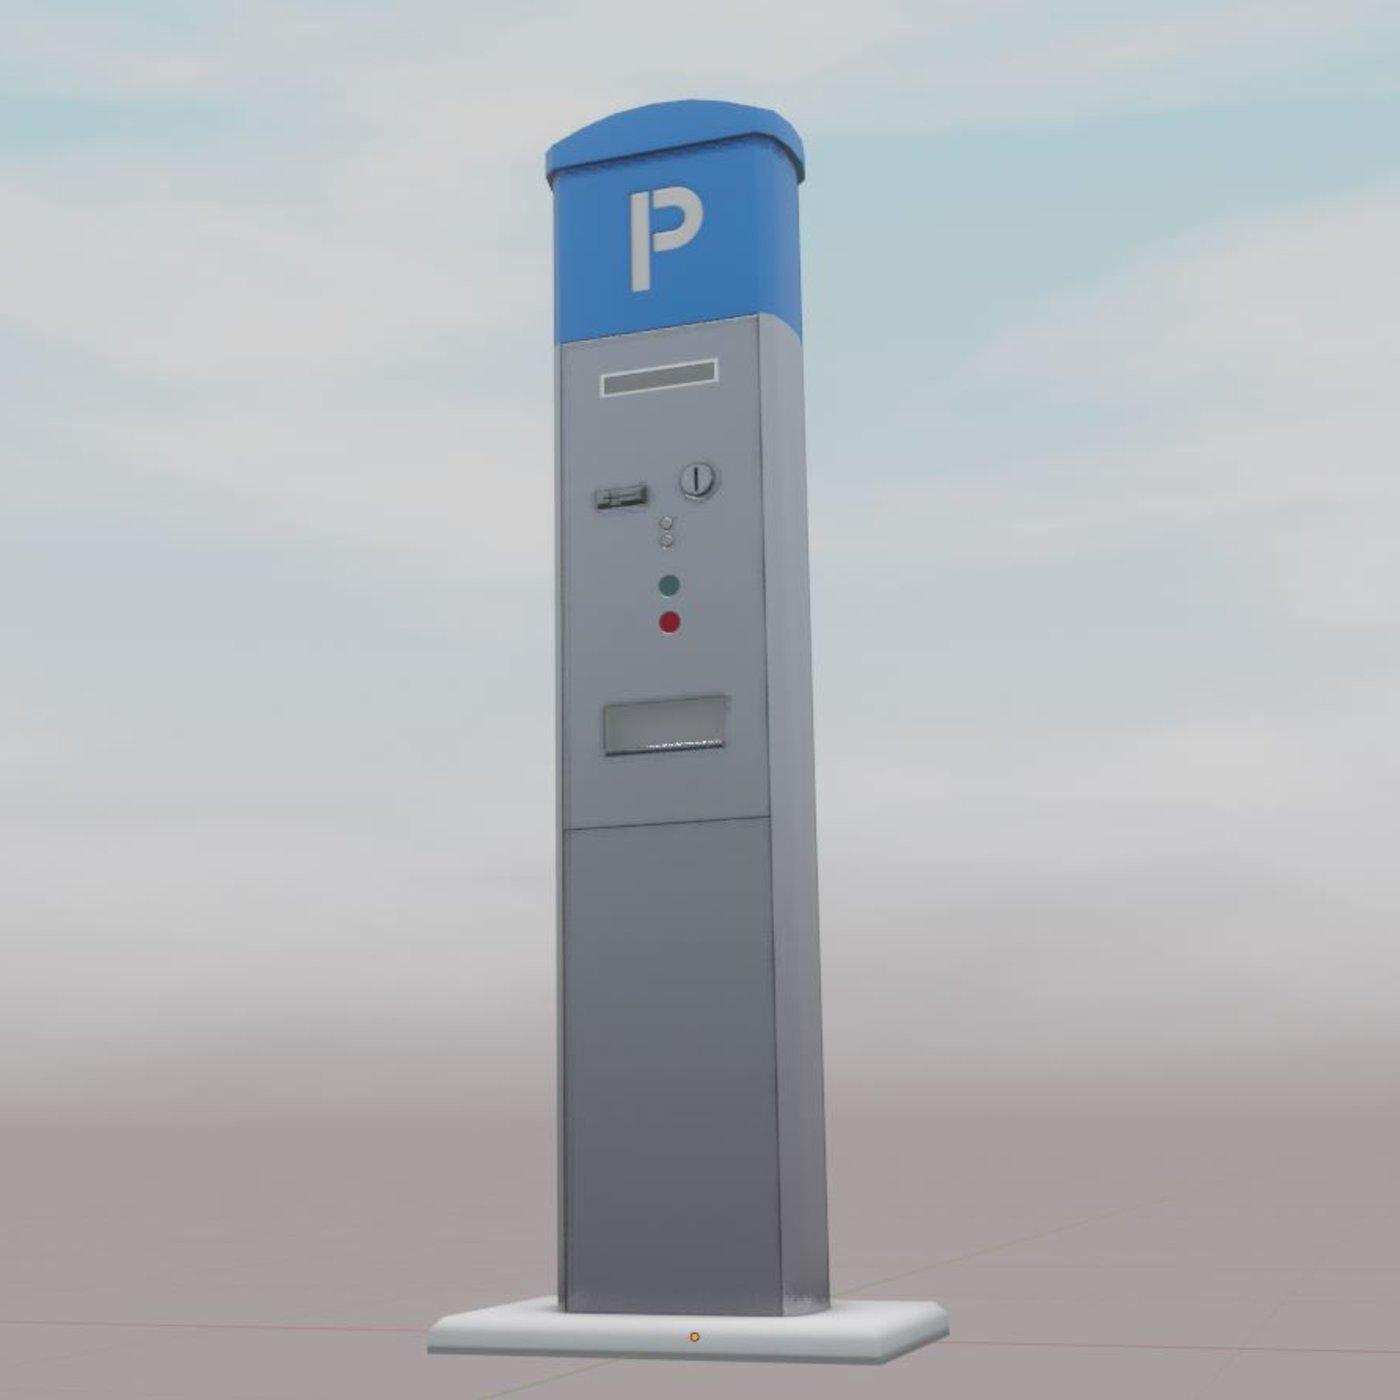 Parking Machine Low-Poly Version